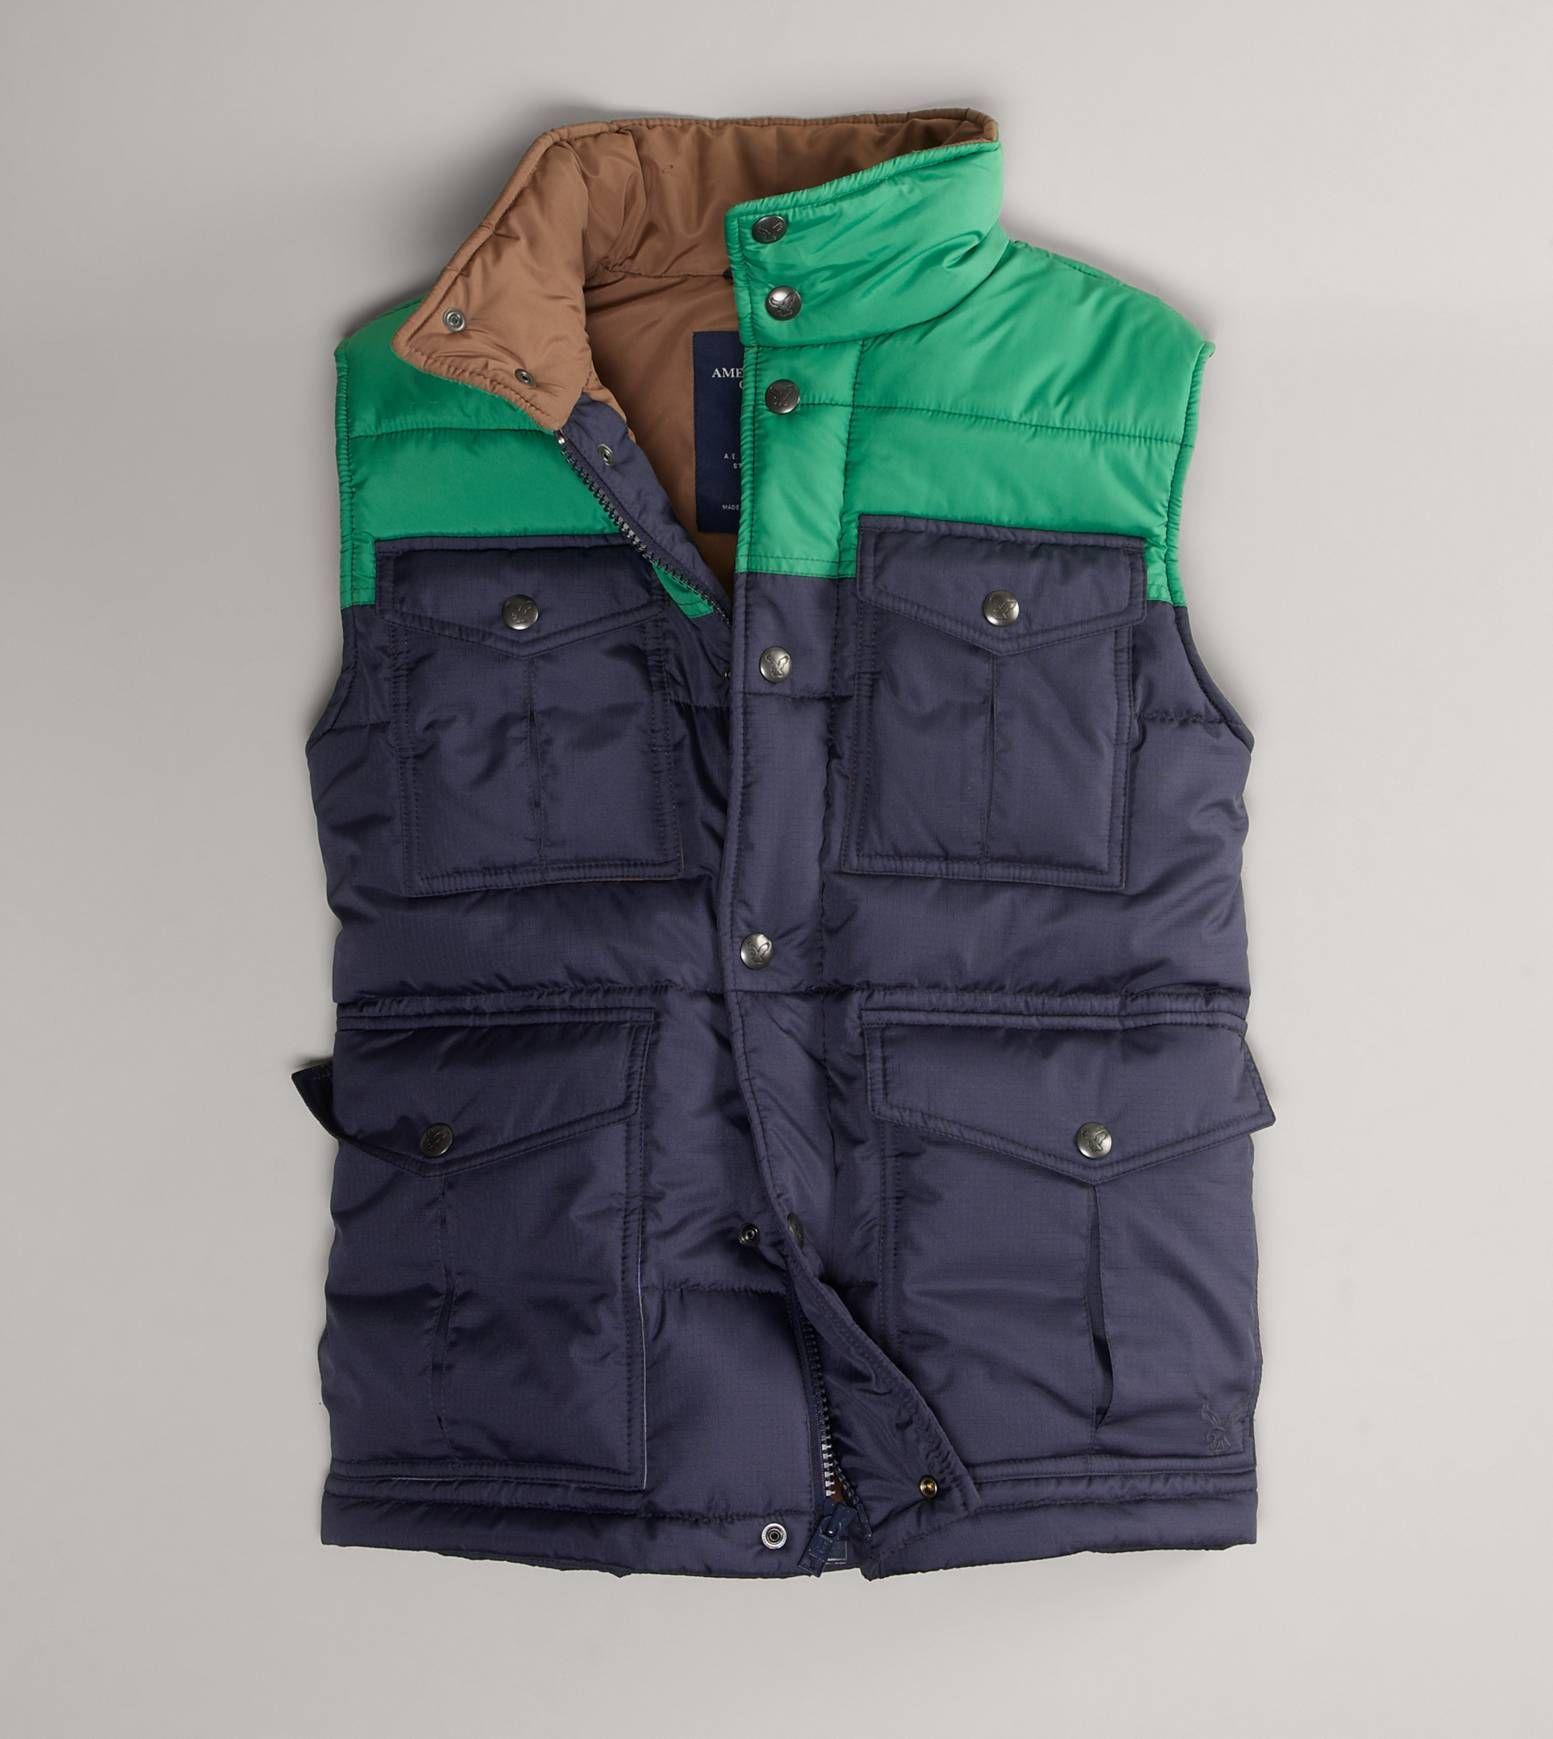 Vintage Workwear Jacket from American Eagle Outfitters ...  Dog Jacket American Eagle Outfitters